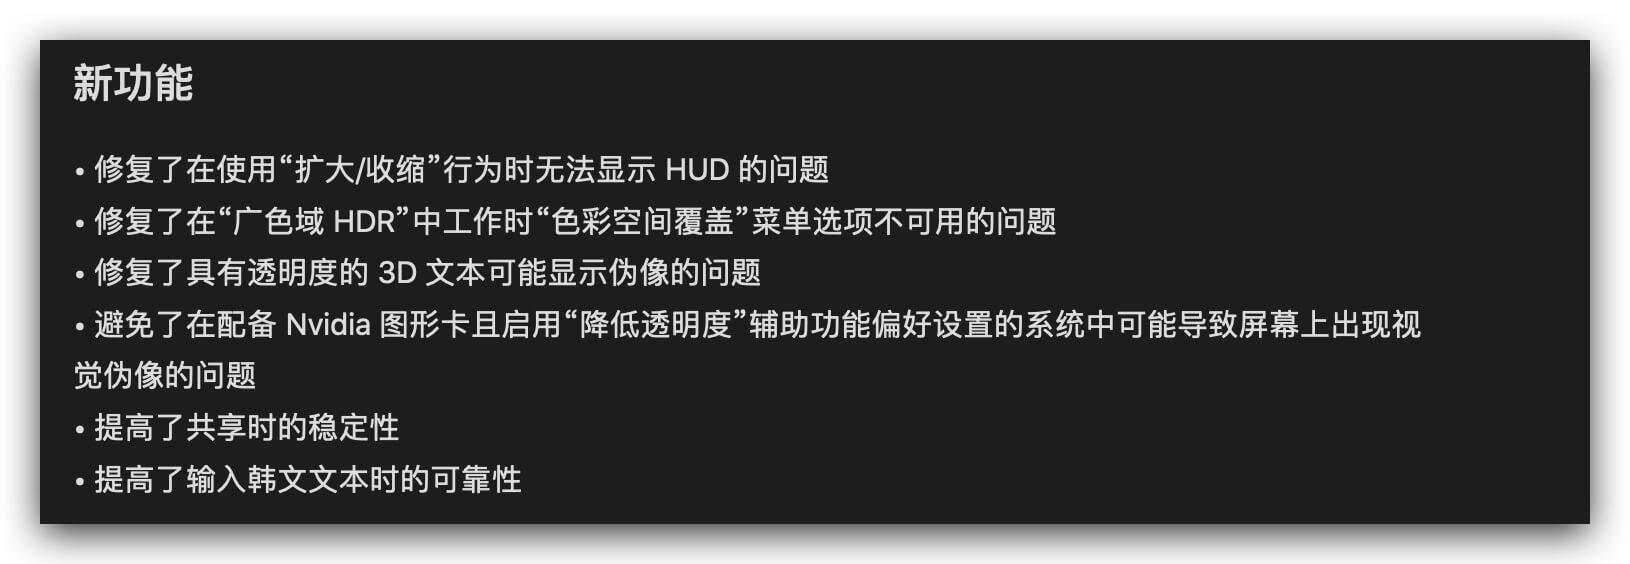 Apple Motion 5.4.5 破解版免费下载 中英文版 苹果视频剪辑软件